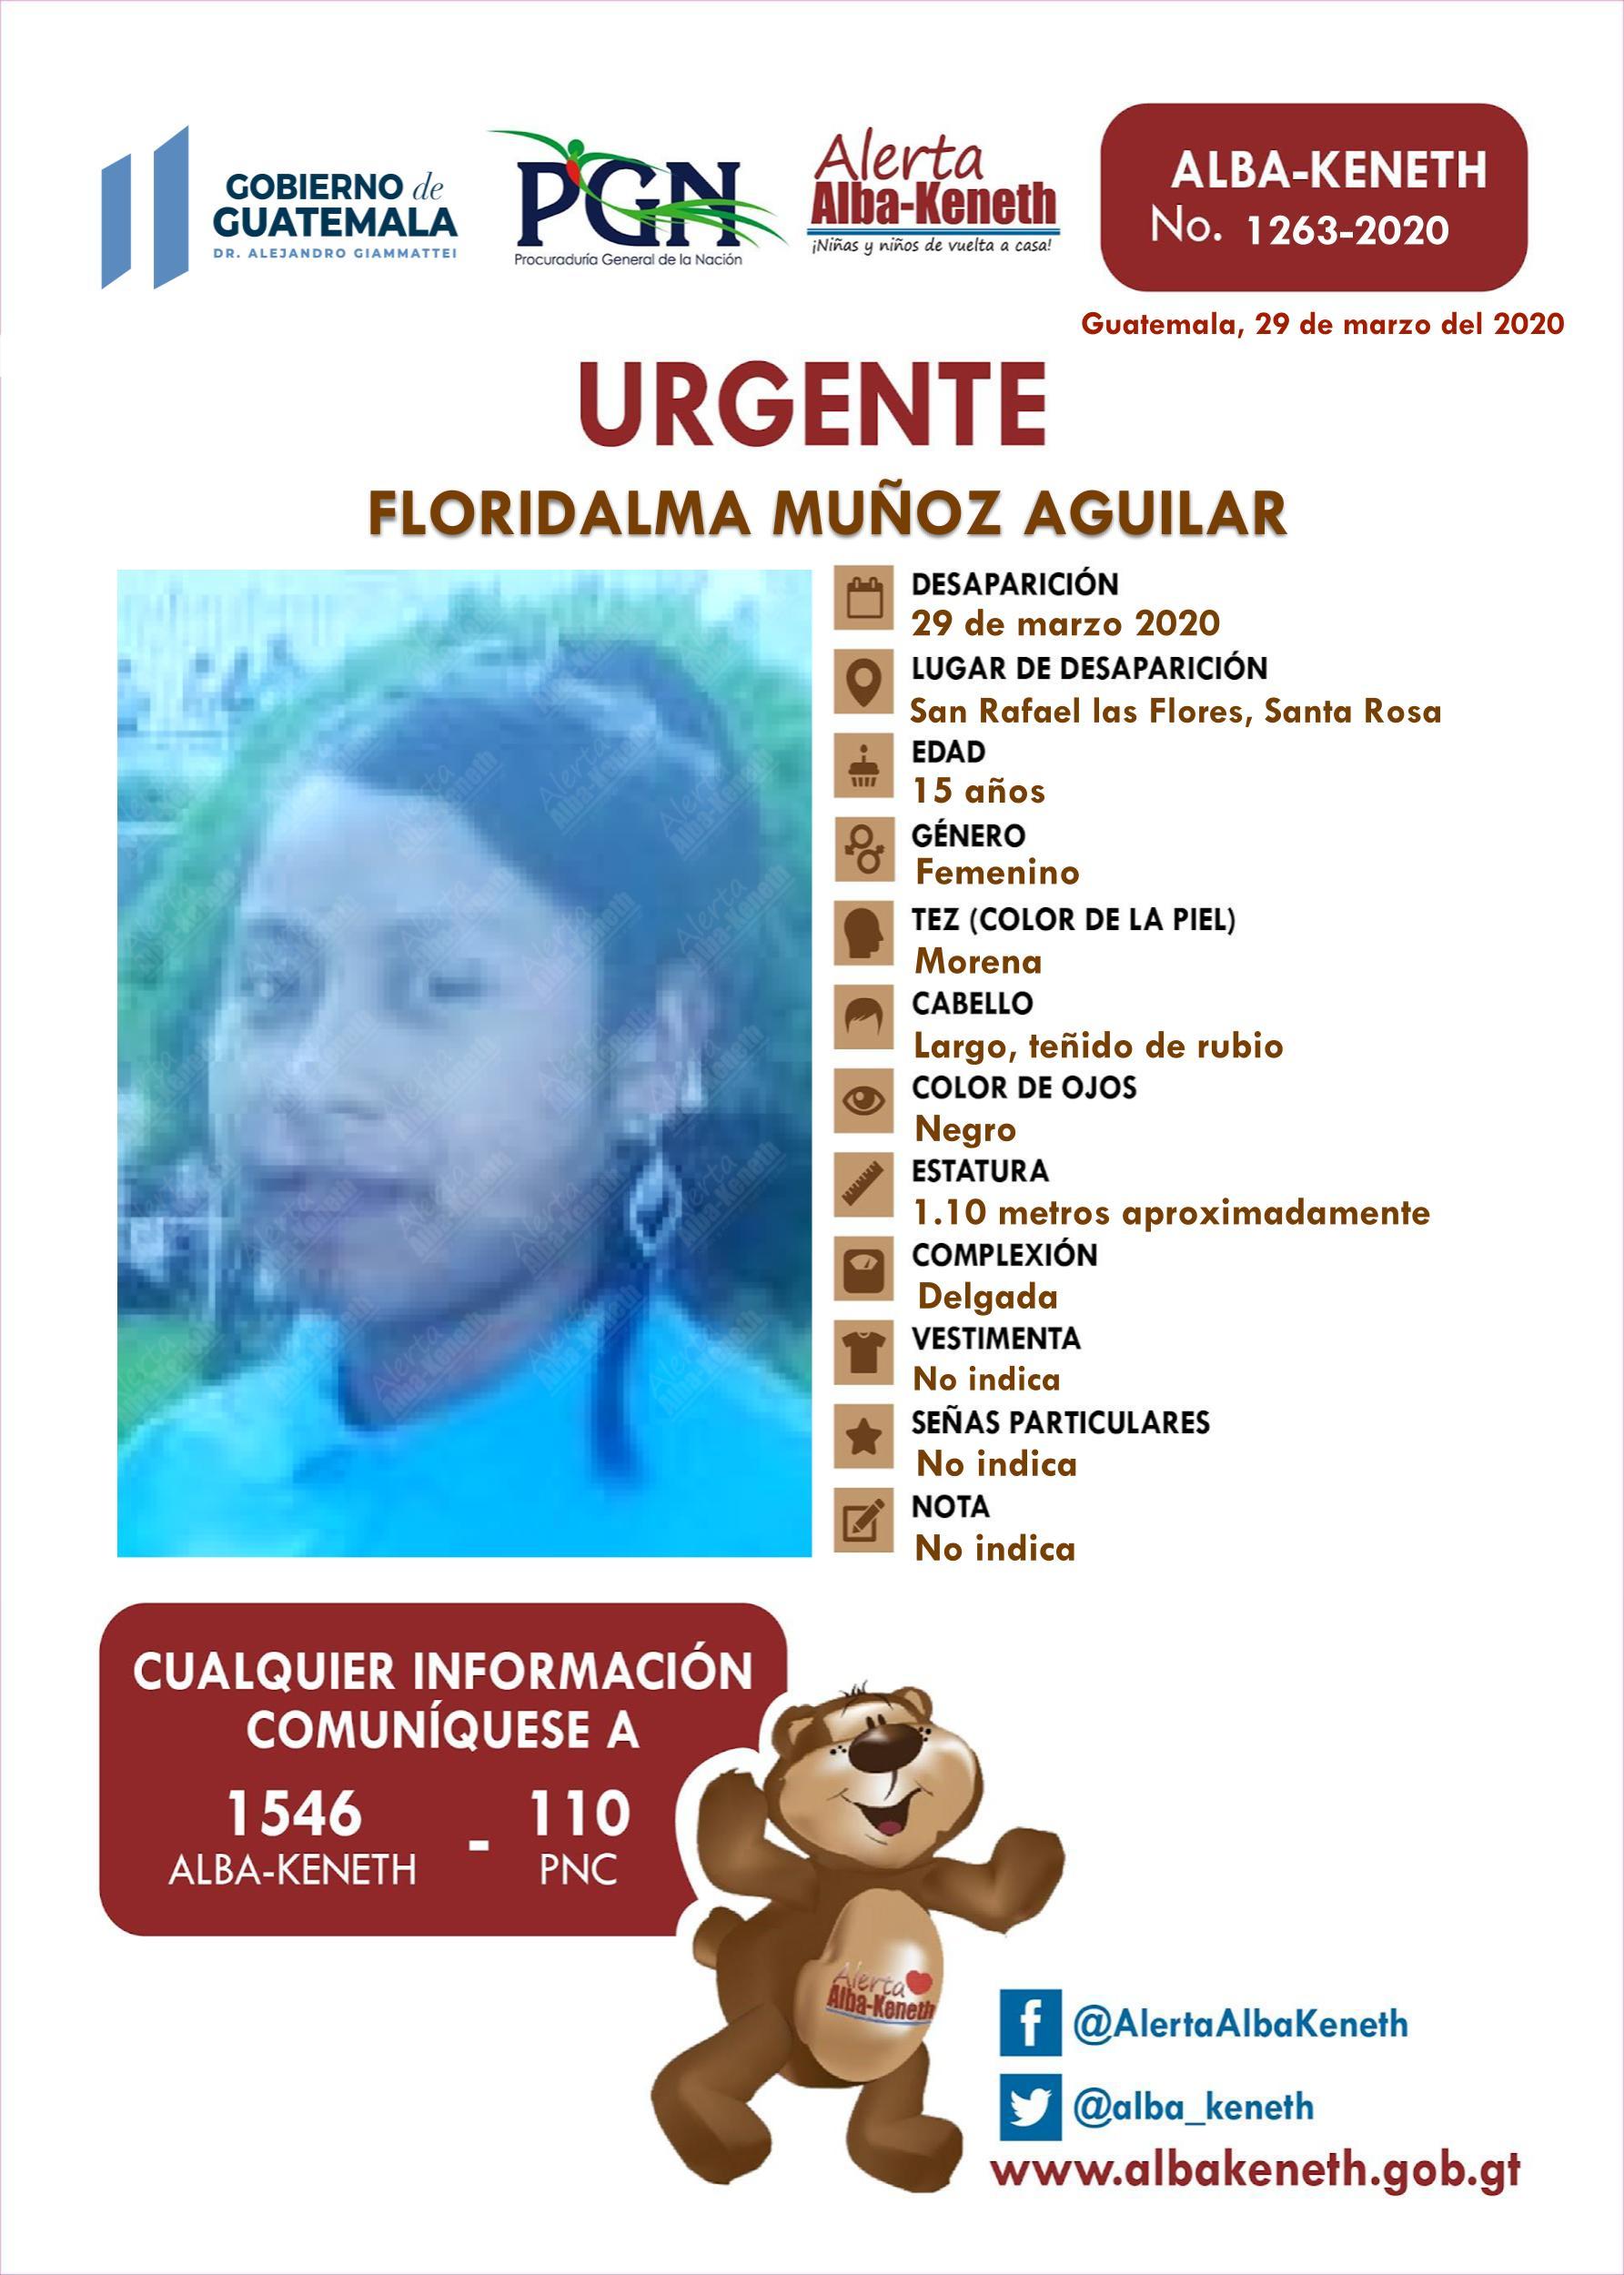 Floridalma Muñoz Aguilar